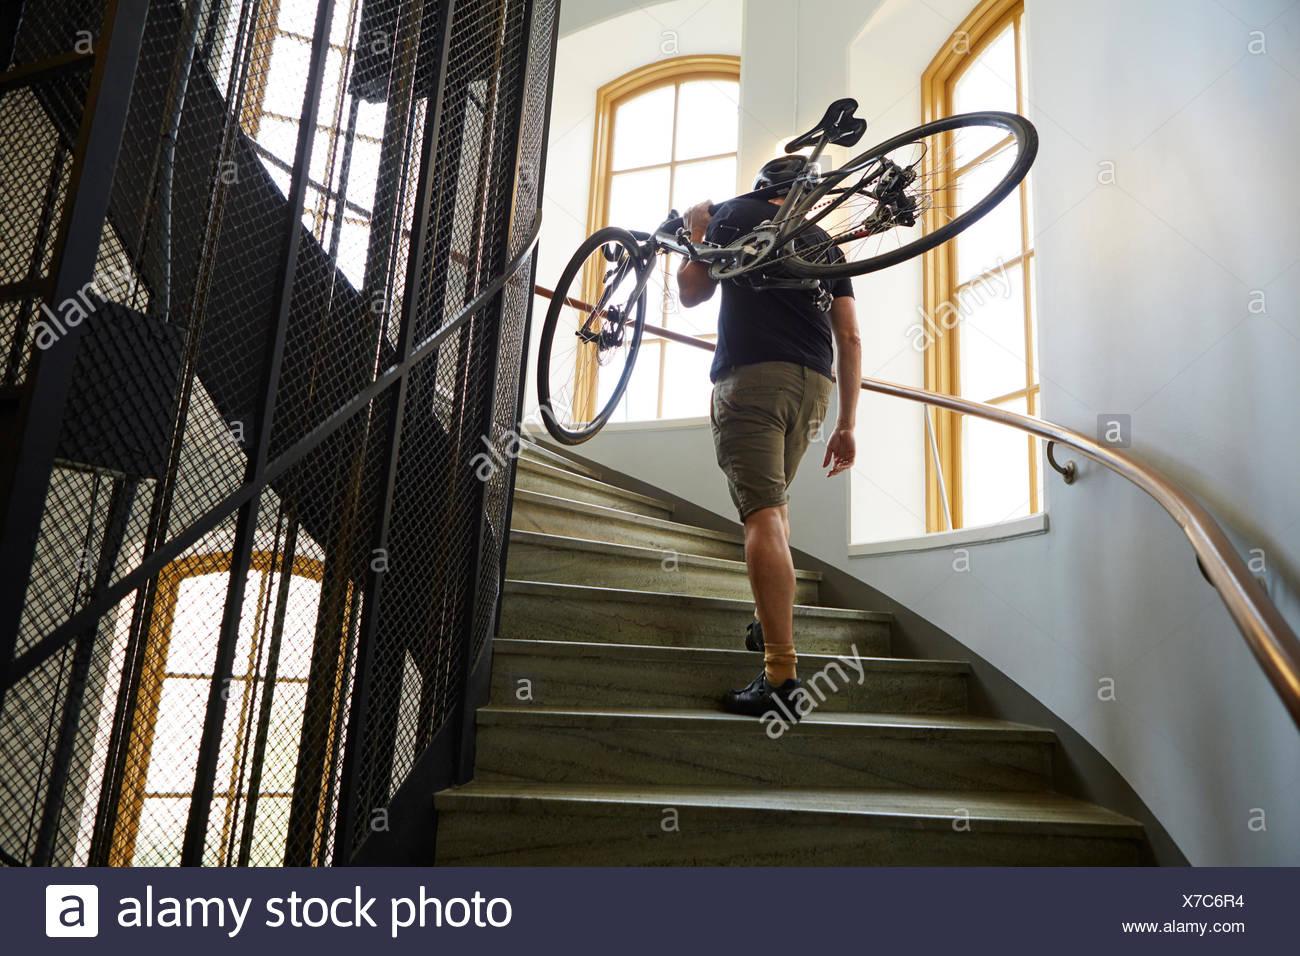 La Suède, l'exercice cycliste vélo sur mesures Photo Stock